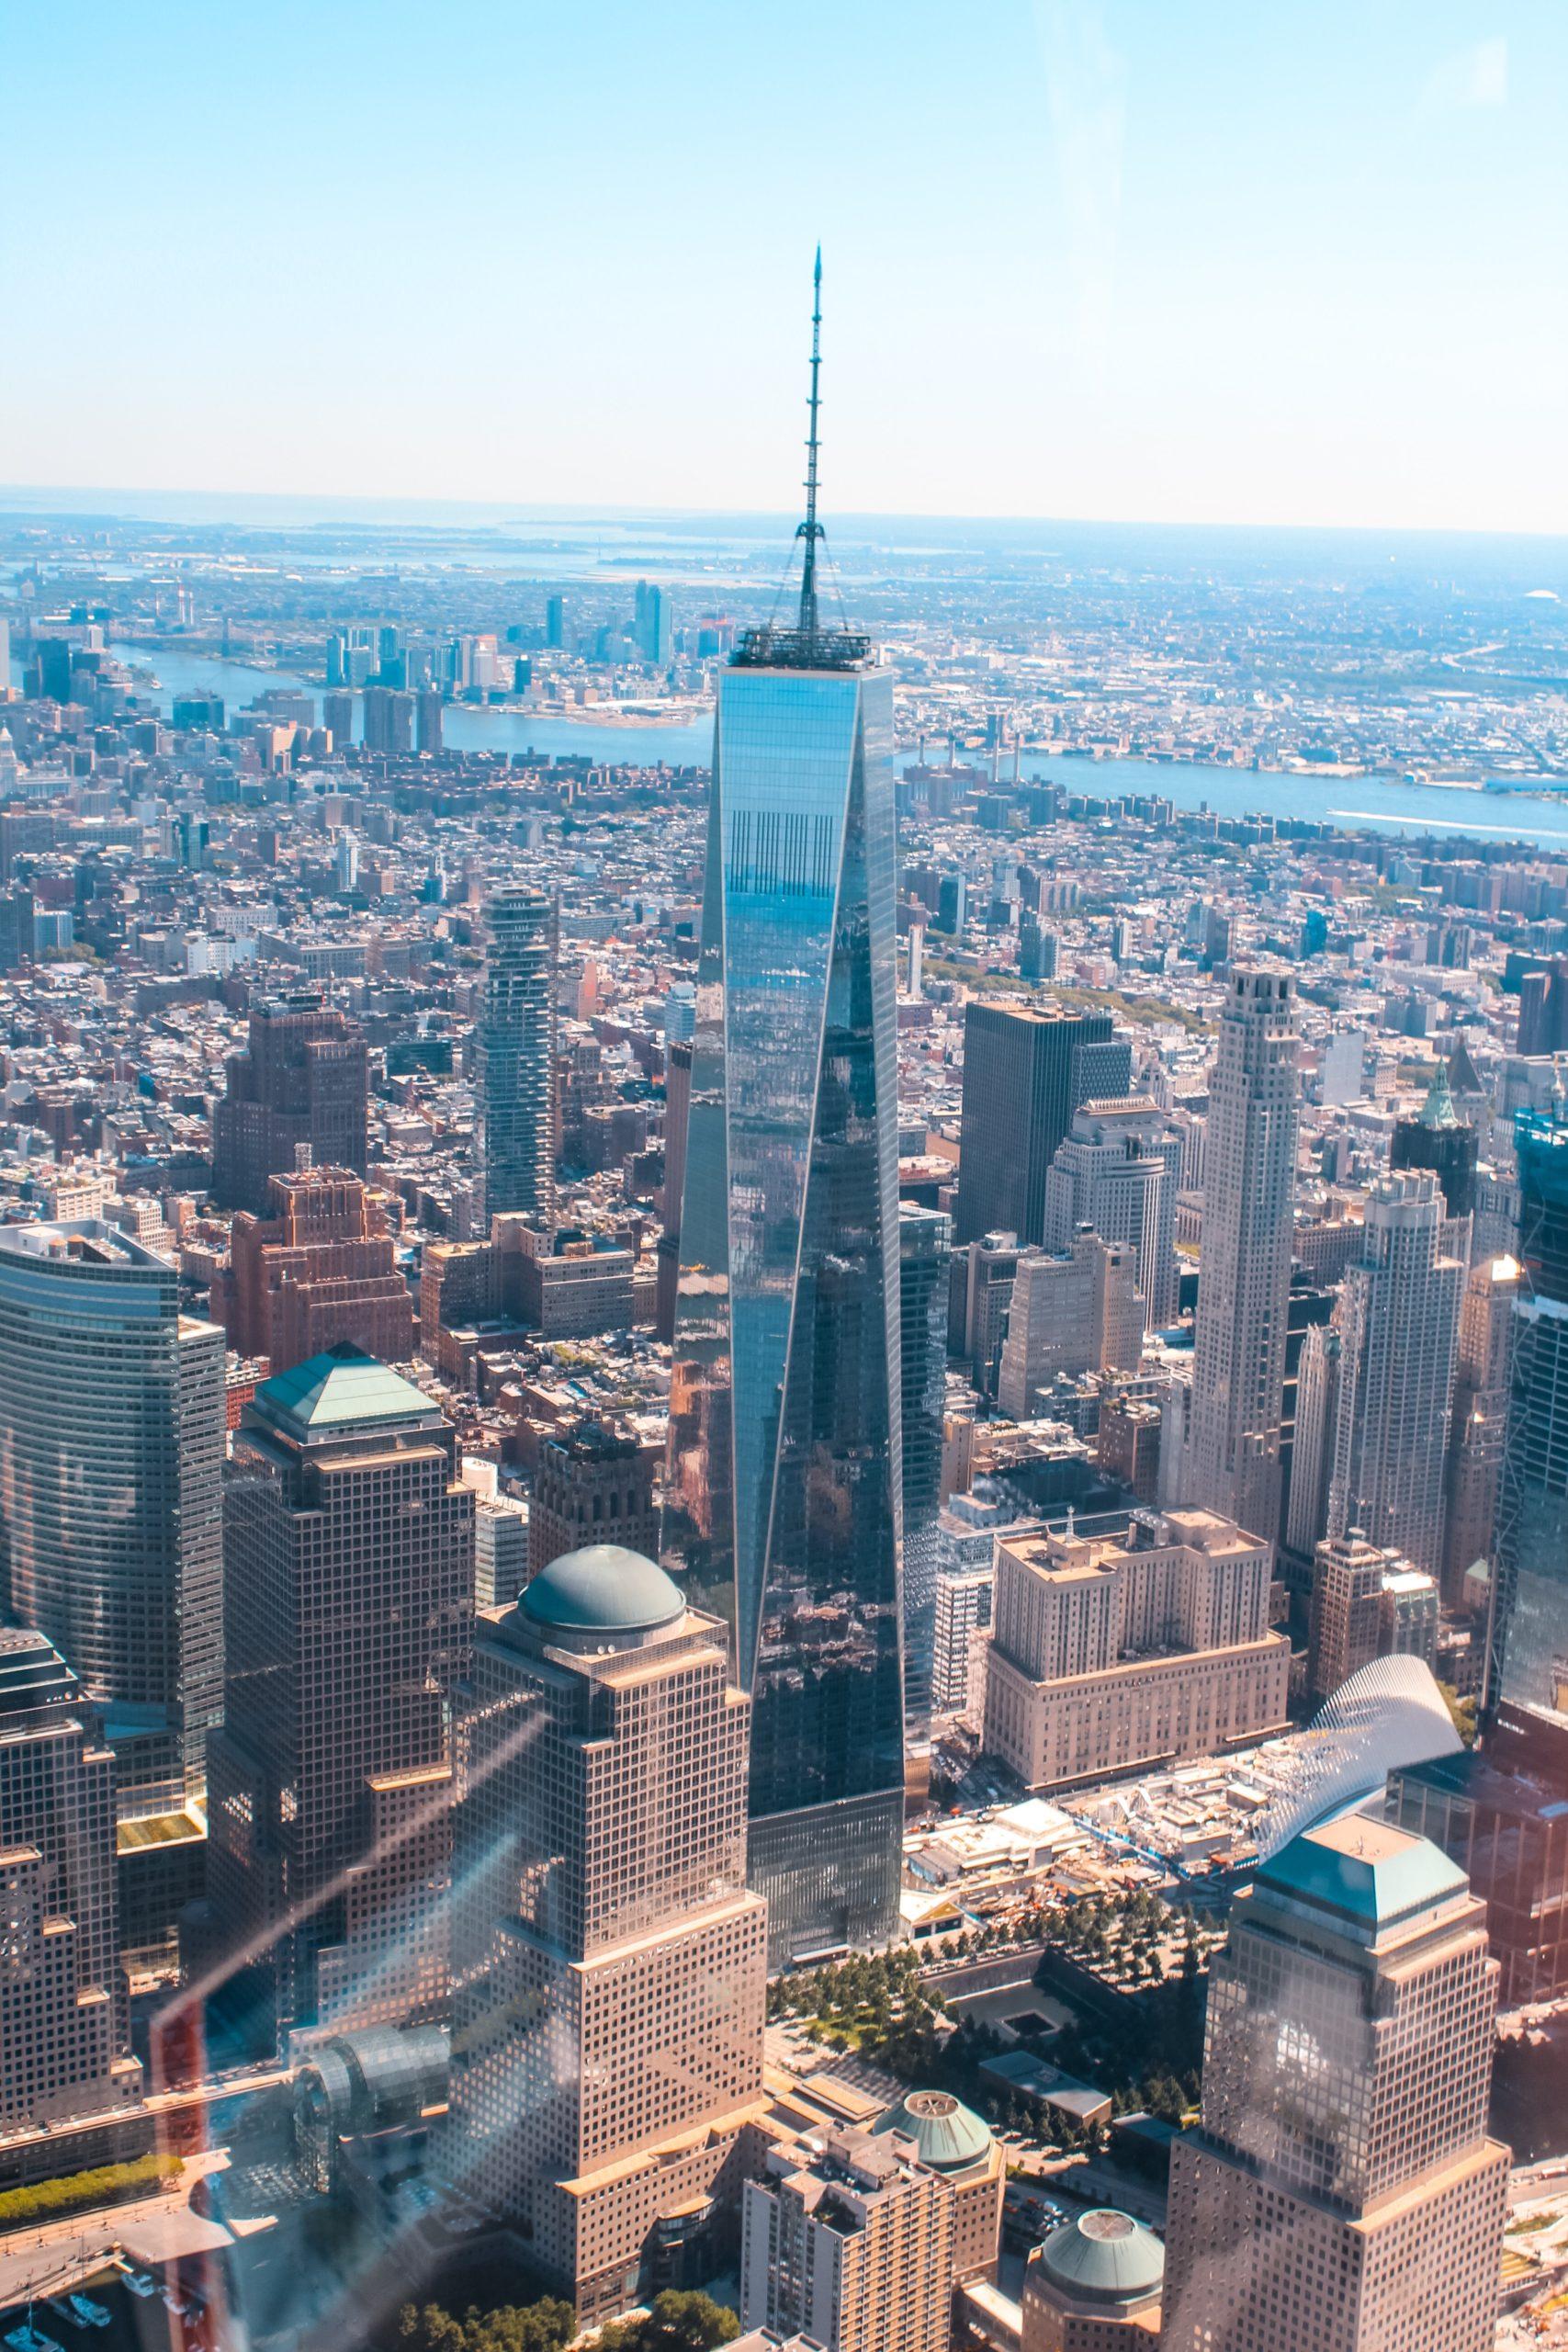 Nowy Jork, Wieża World trade center